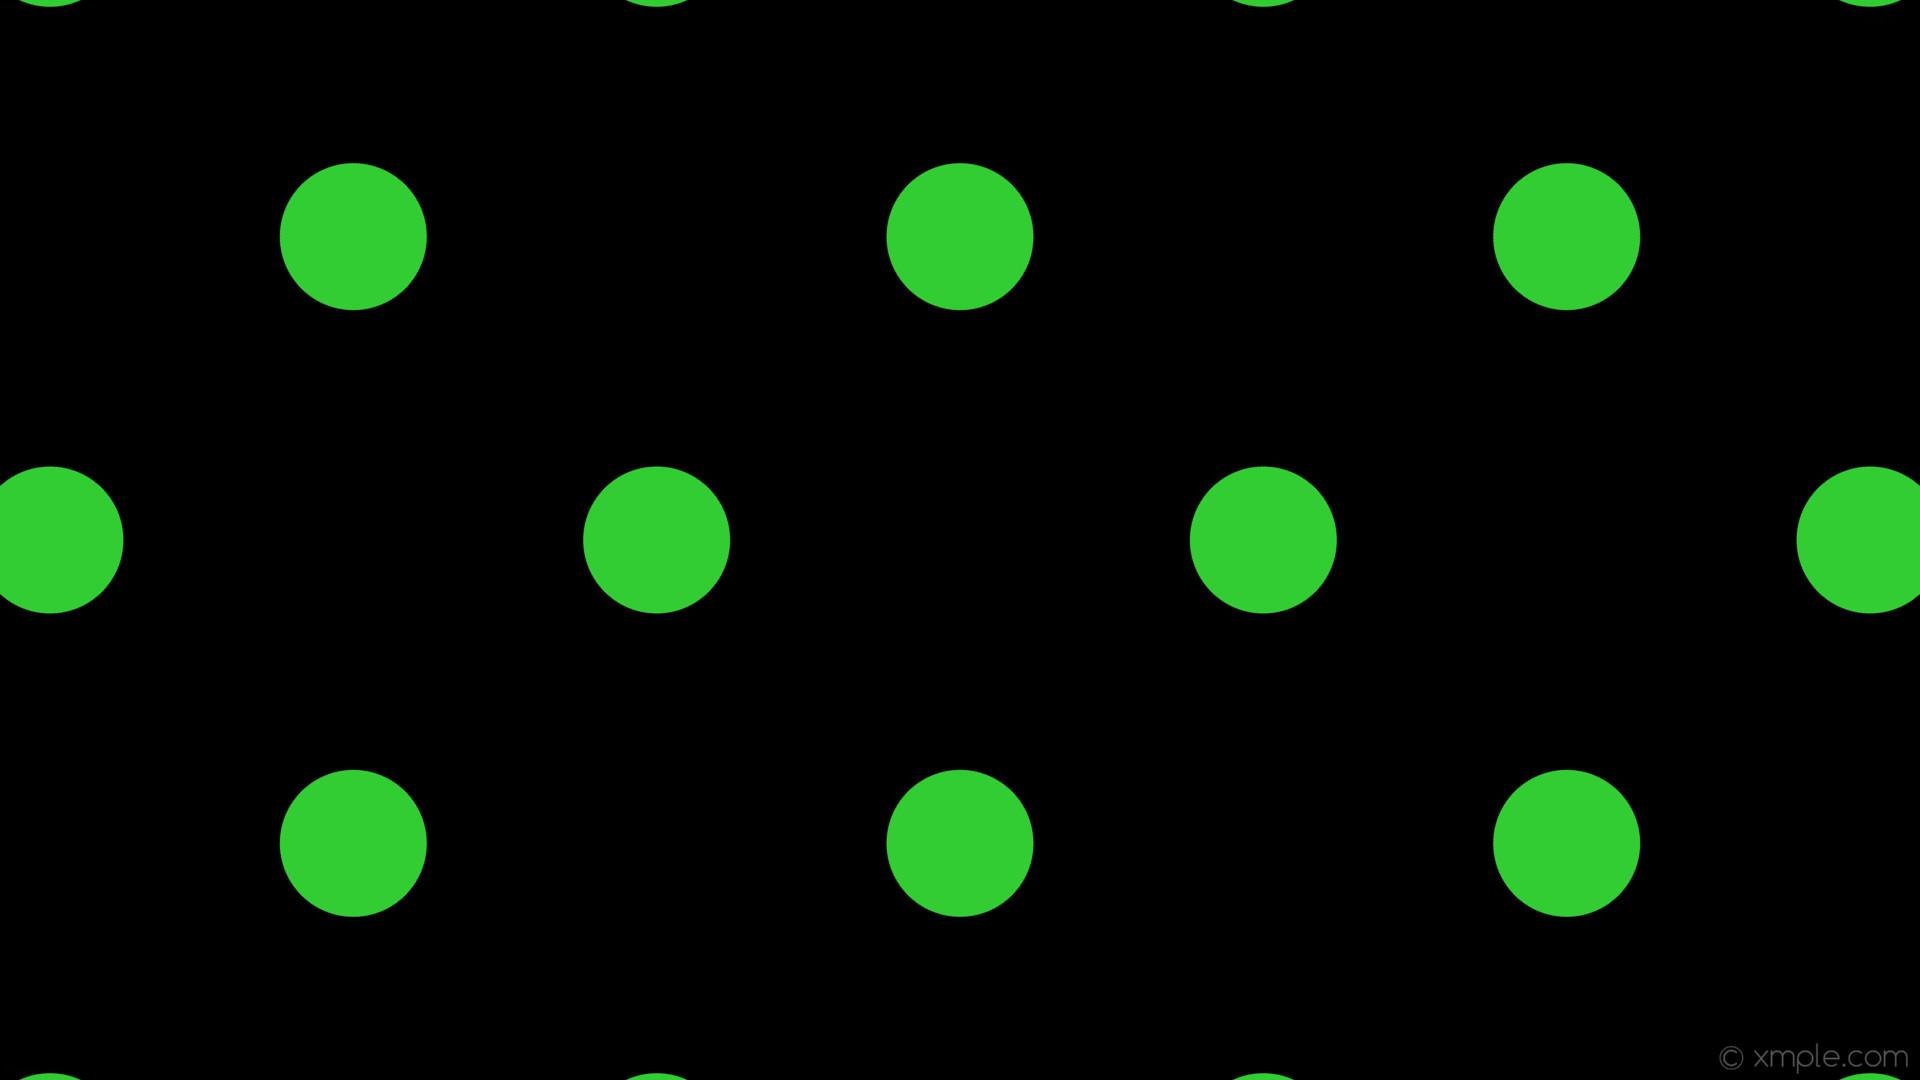 wallpaper dots green spots polka black lime green #000000 #32cd32 135°  147px 429px